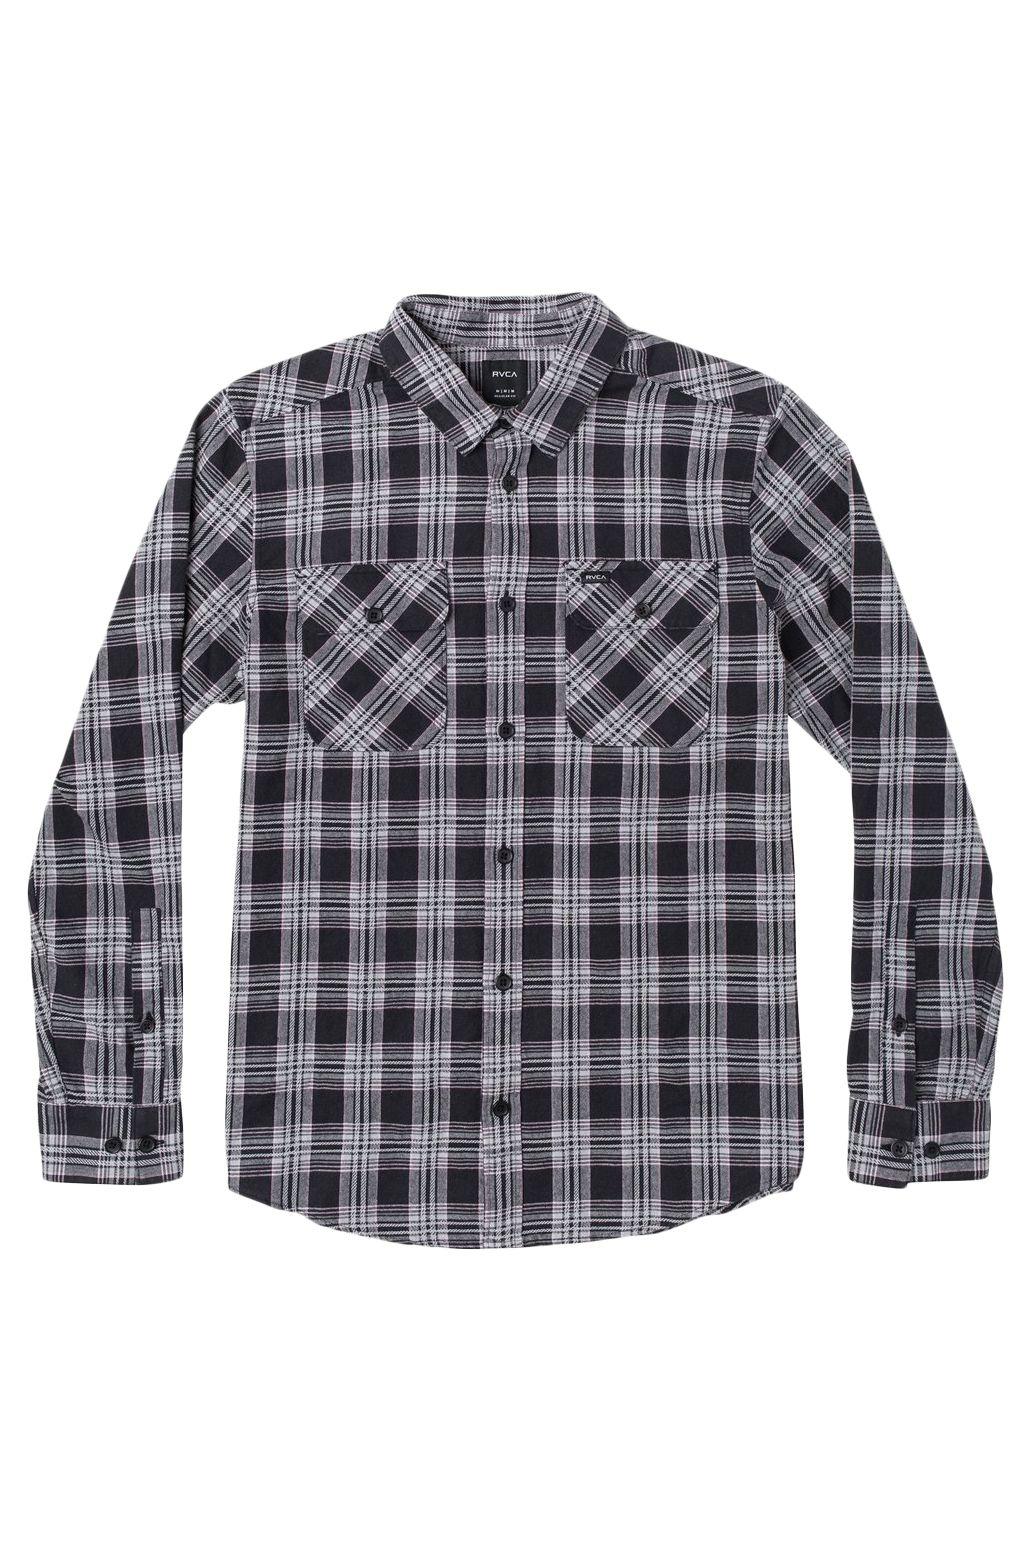 RVCA Shirt THATLL WORK FLANNEL Black